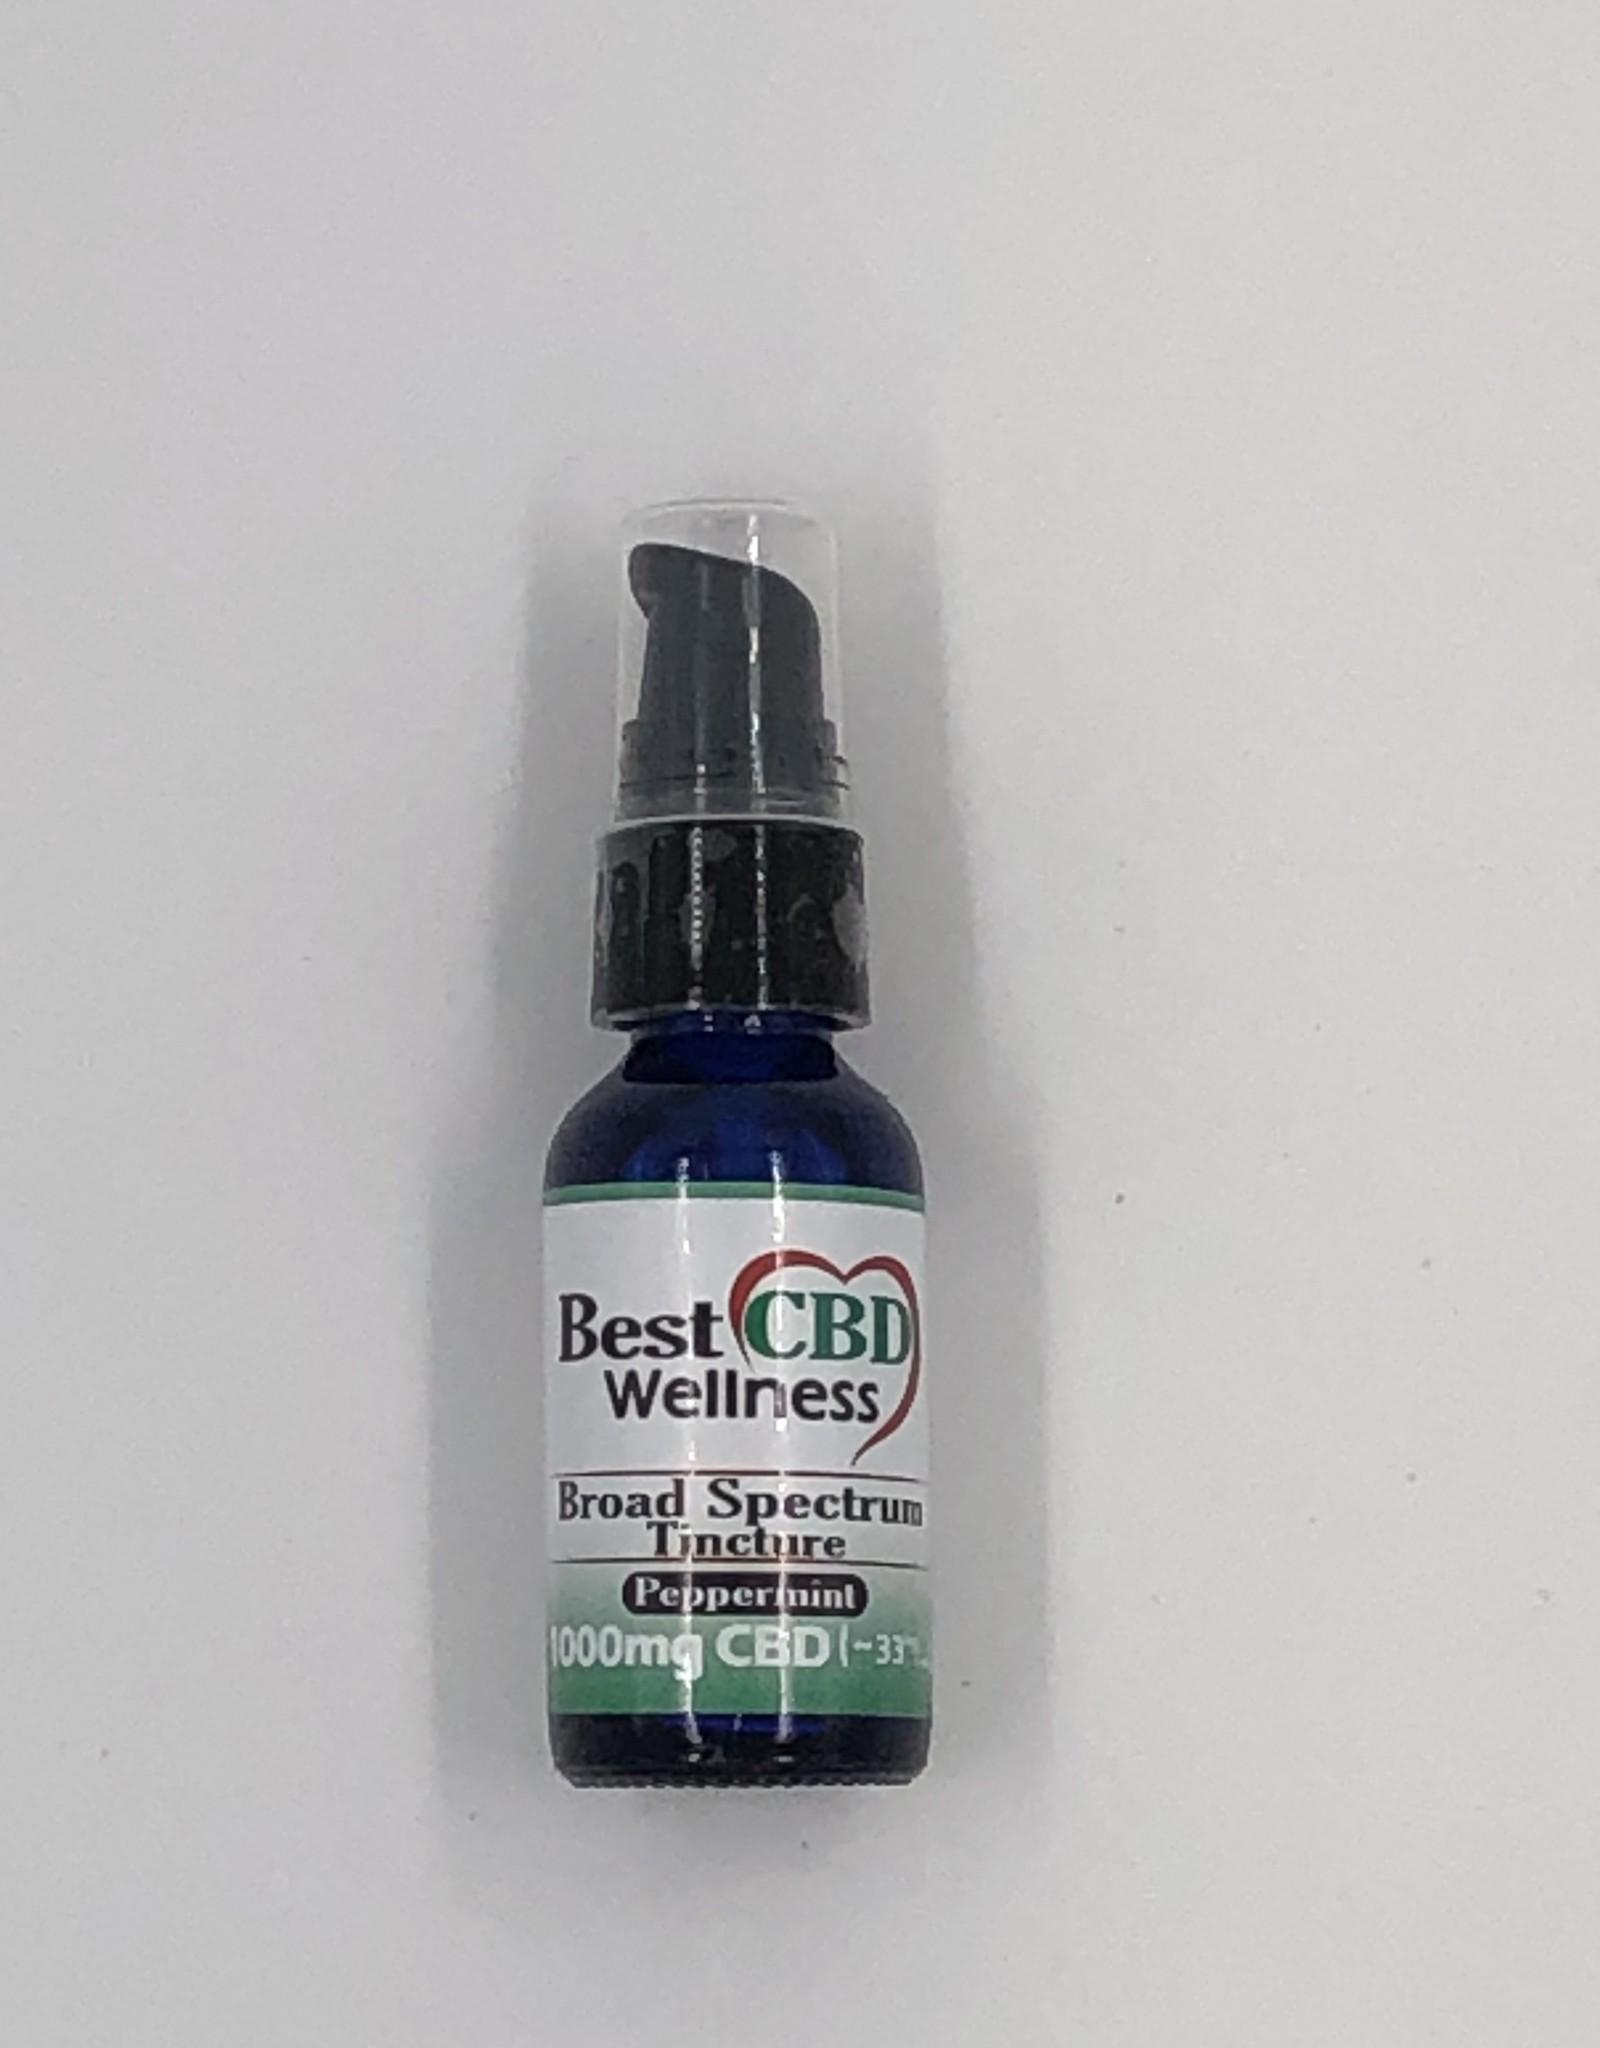 Best CBD Wellness Broad Spectrum CBD Oil Tincture 1000mg Peppermint 30ml